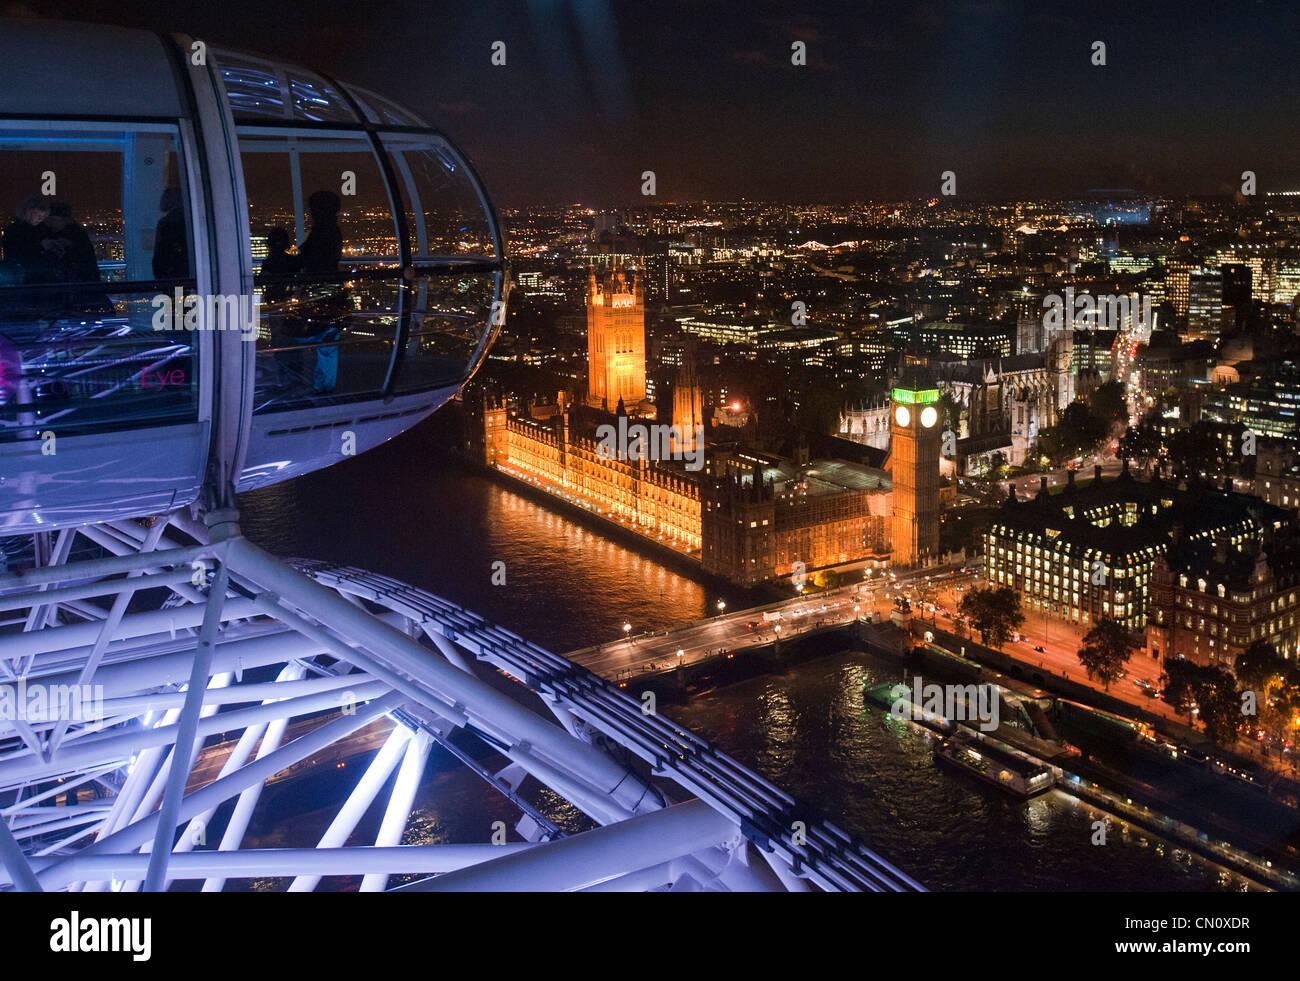 Big Ben near River Thames seen from the London Eye Ferris wheel in London, England, on November 4, 2009. (Adrien - Stock Image